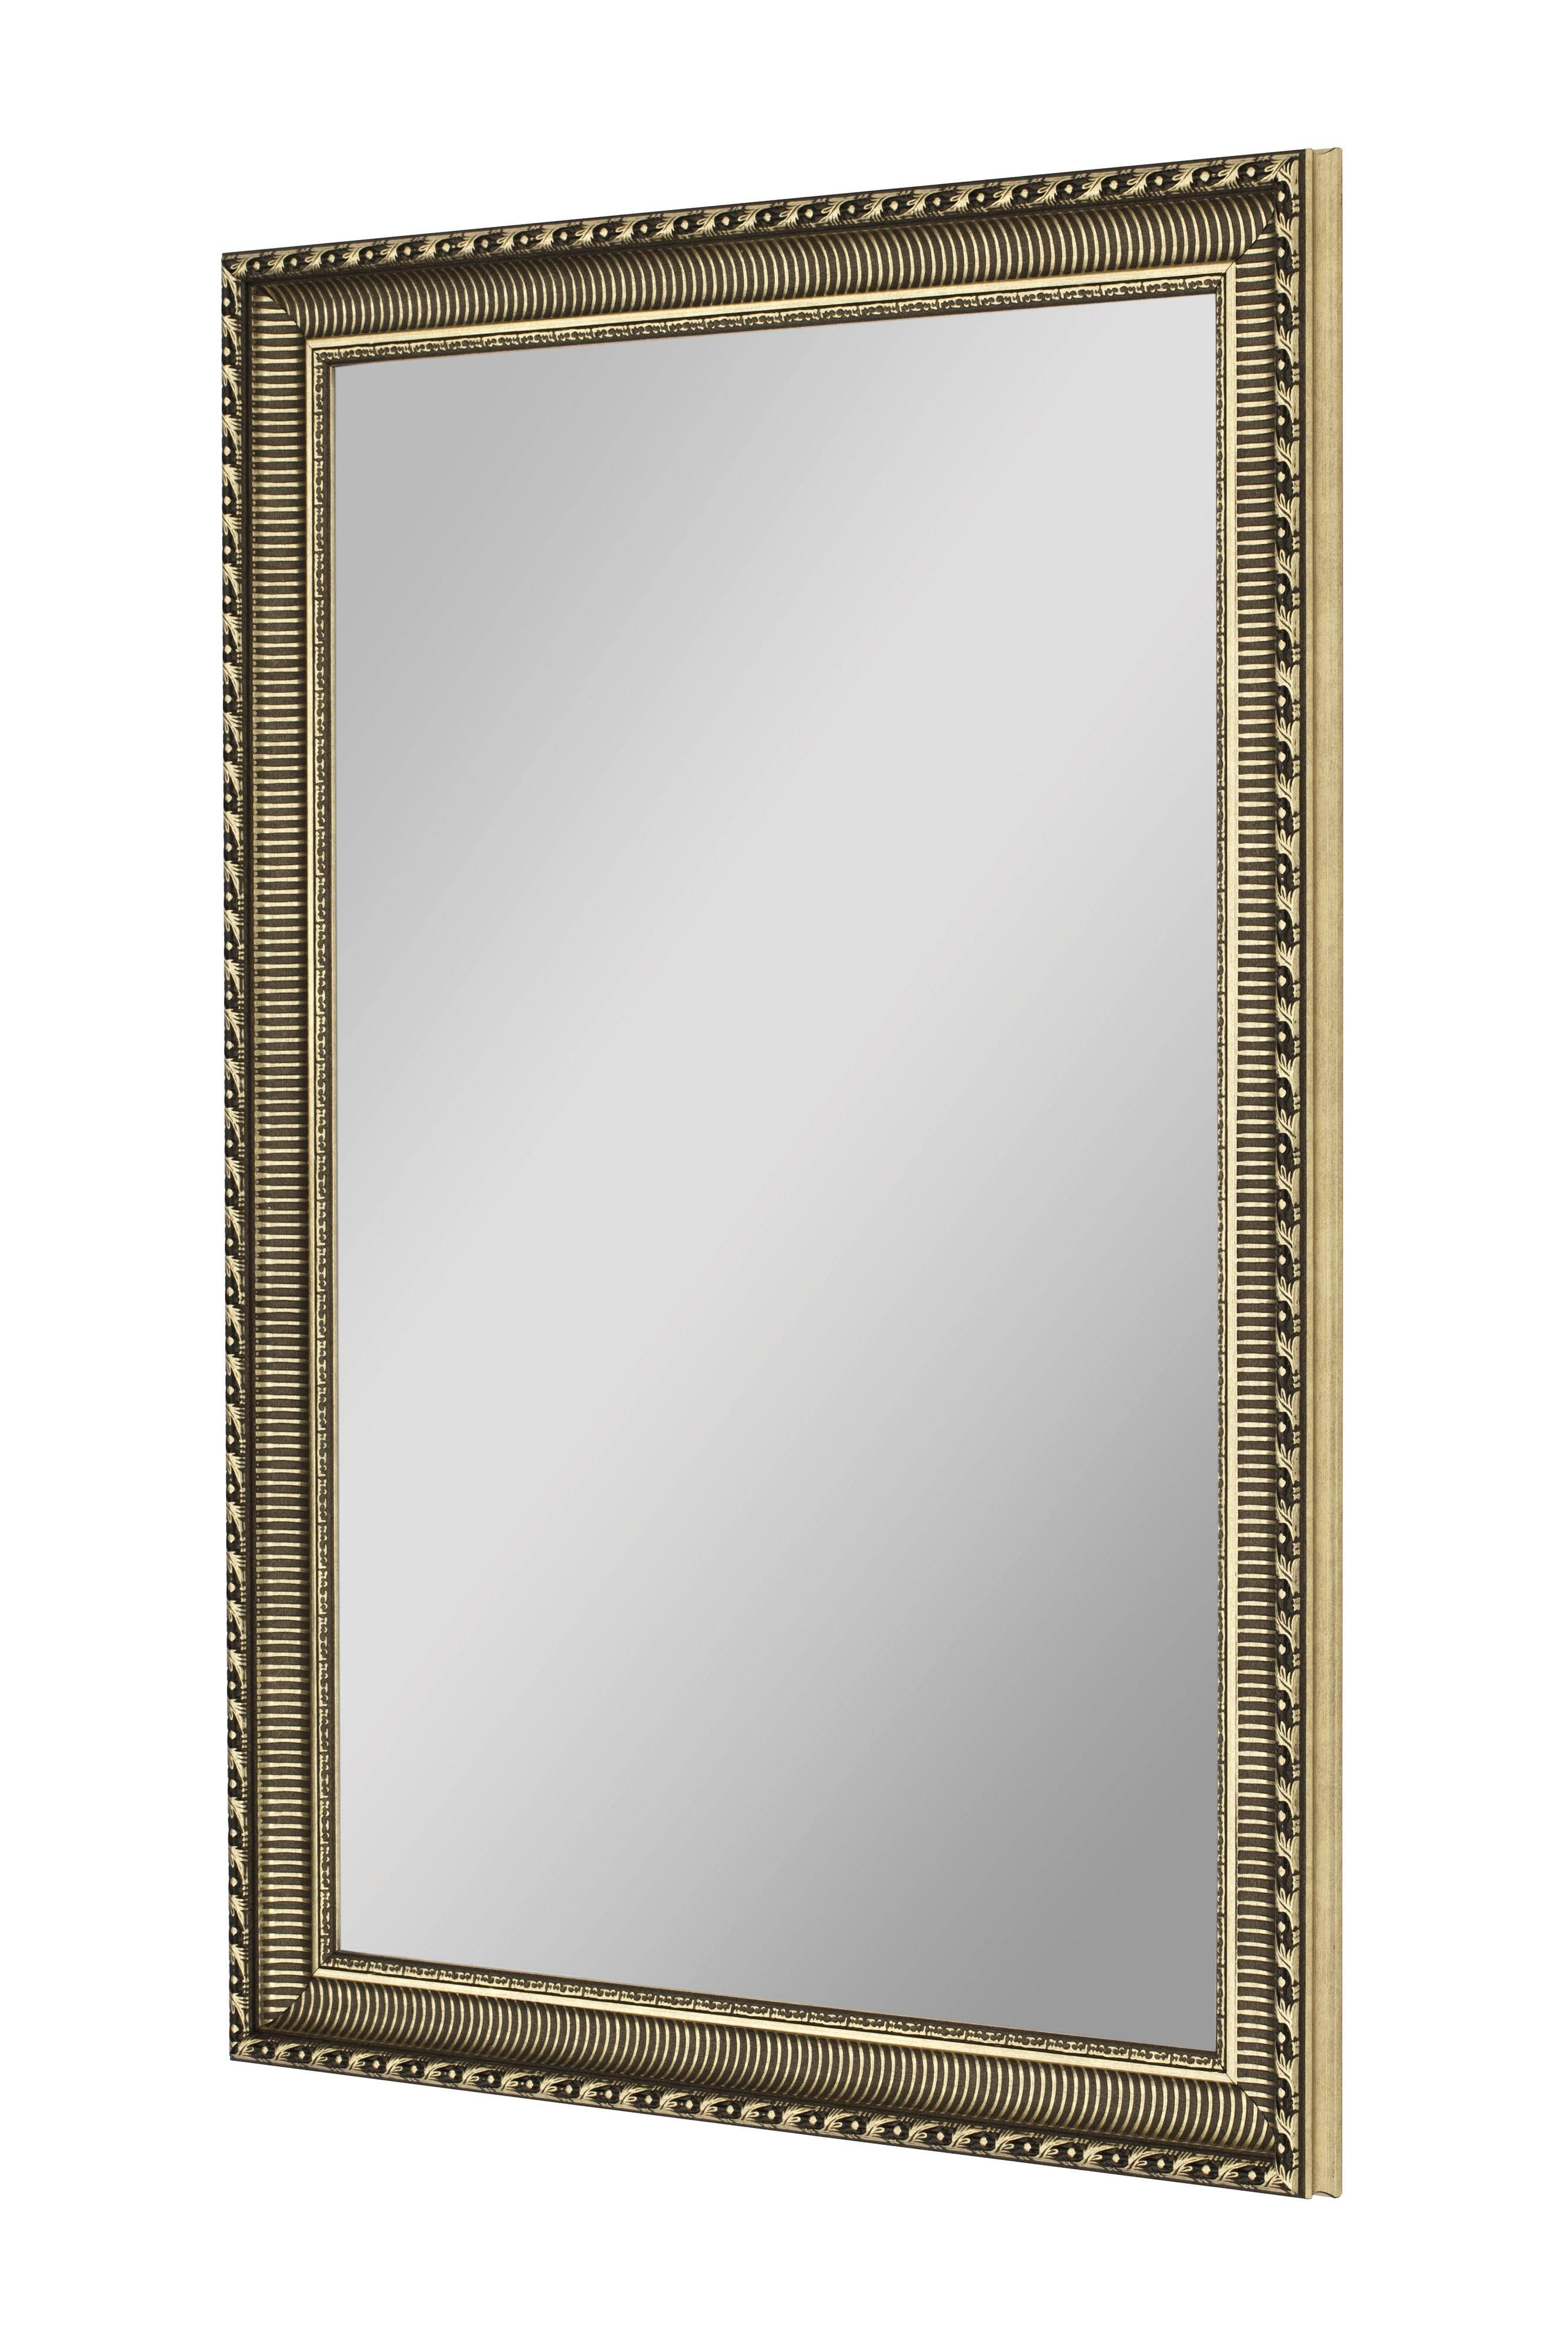 Rectangular Wall Mirrors Decorative More Image Visit Https Homecreativa Com Rectangular Wall Mirrors D Mirror Wall Decor Mirror Wall Modern Mirror Wall